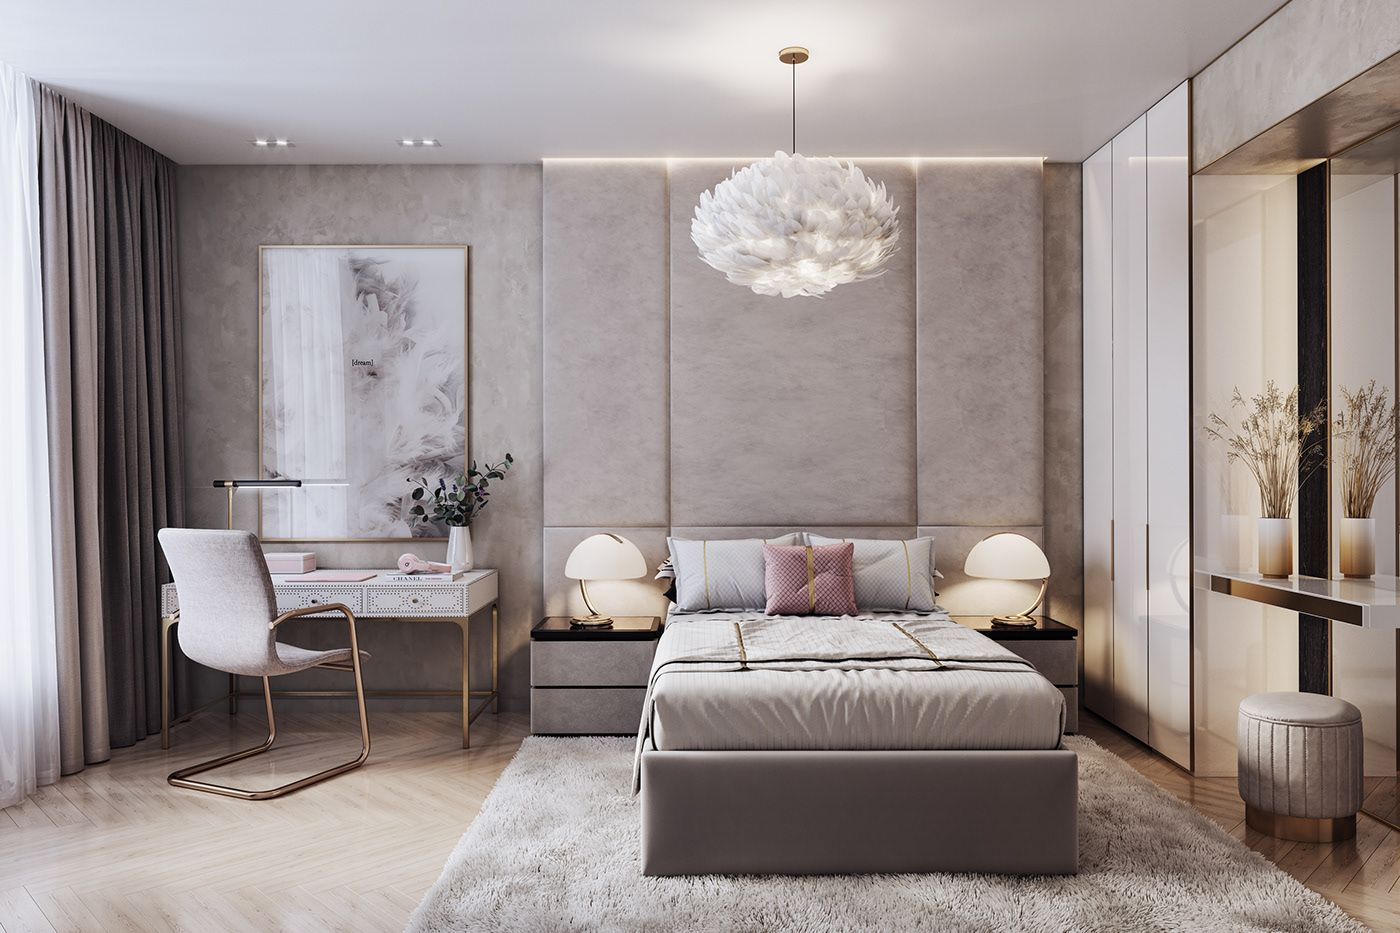 2 Bedroom Apartment Interior Design On Behance Apartment